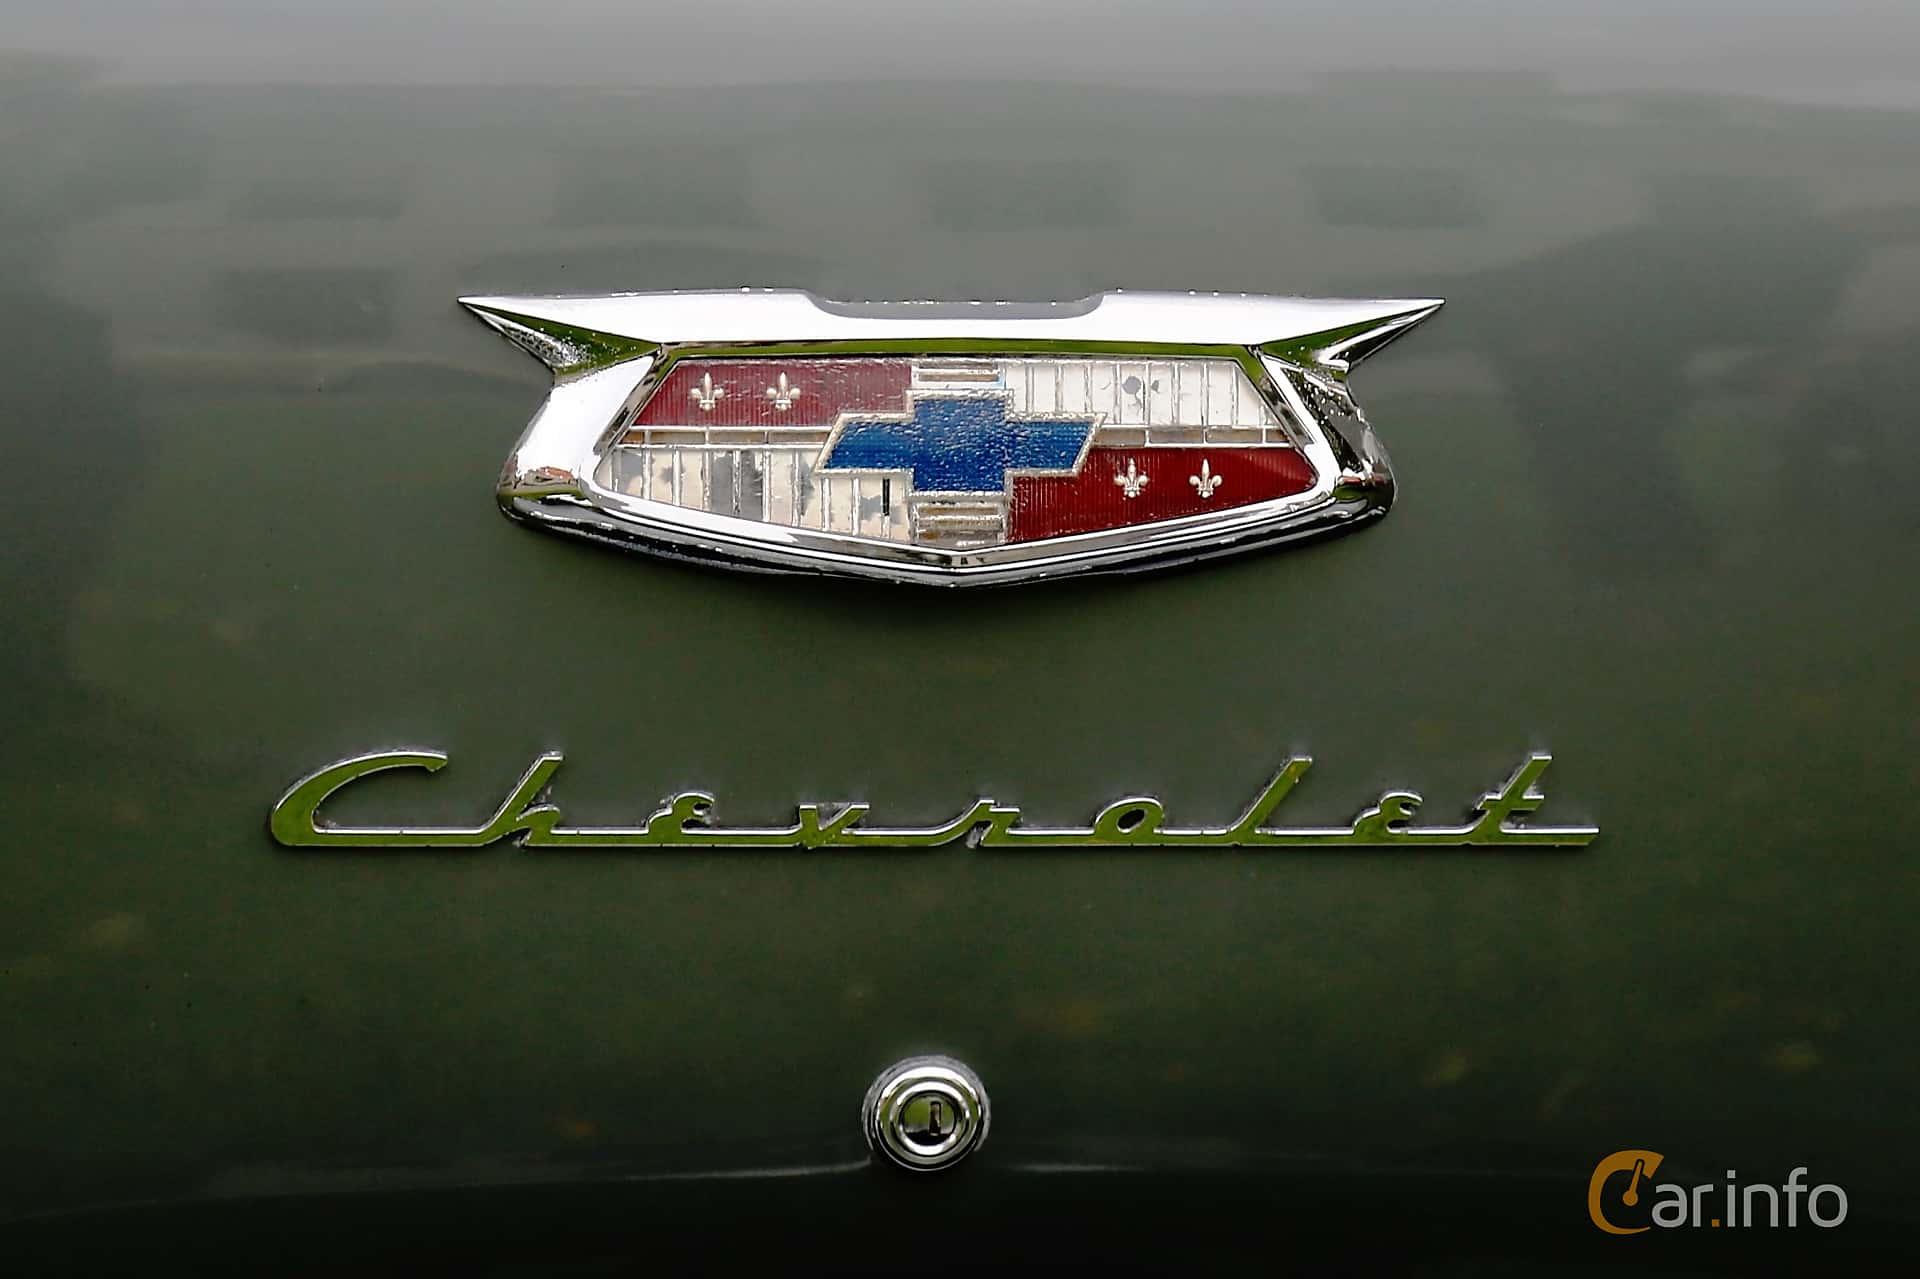 Chevrolet Bel Air 4-door Sedan 3.9 Manual, 117hp, 1954